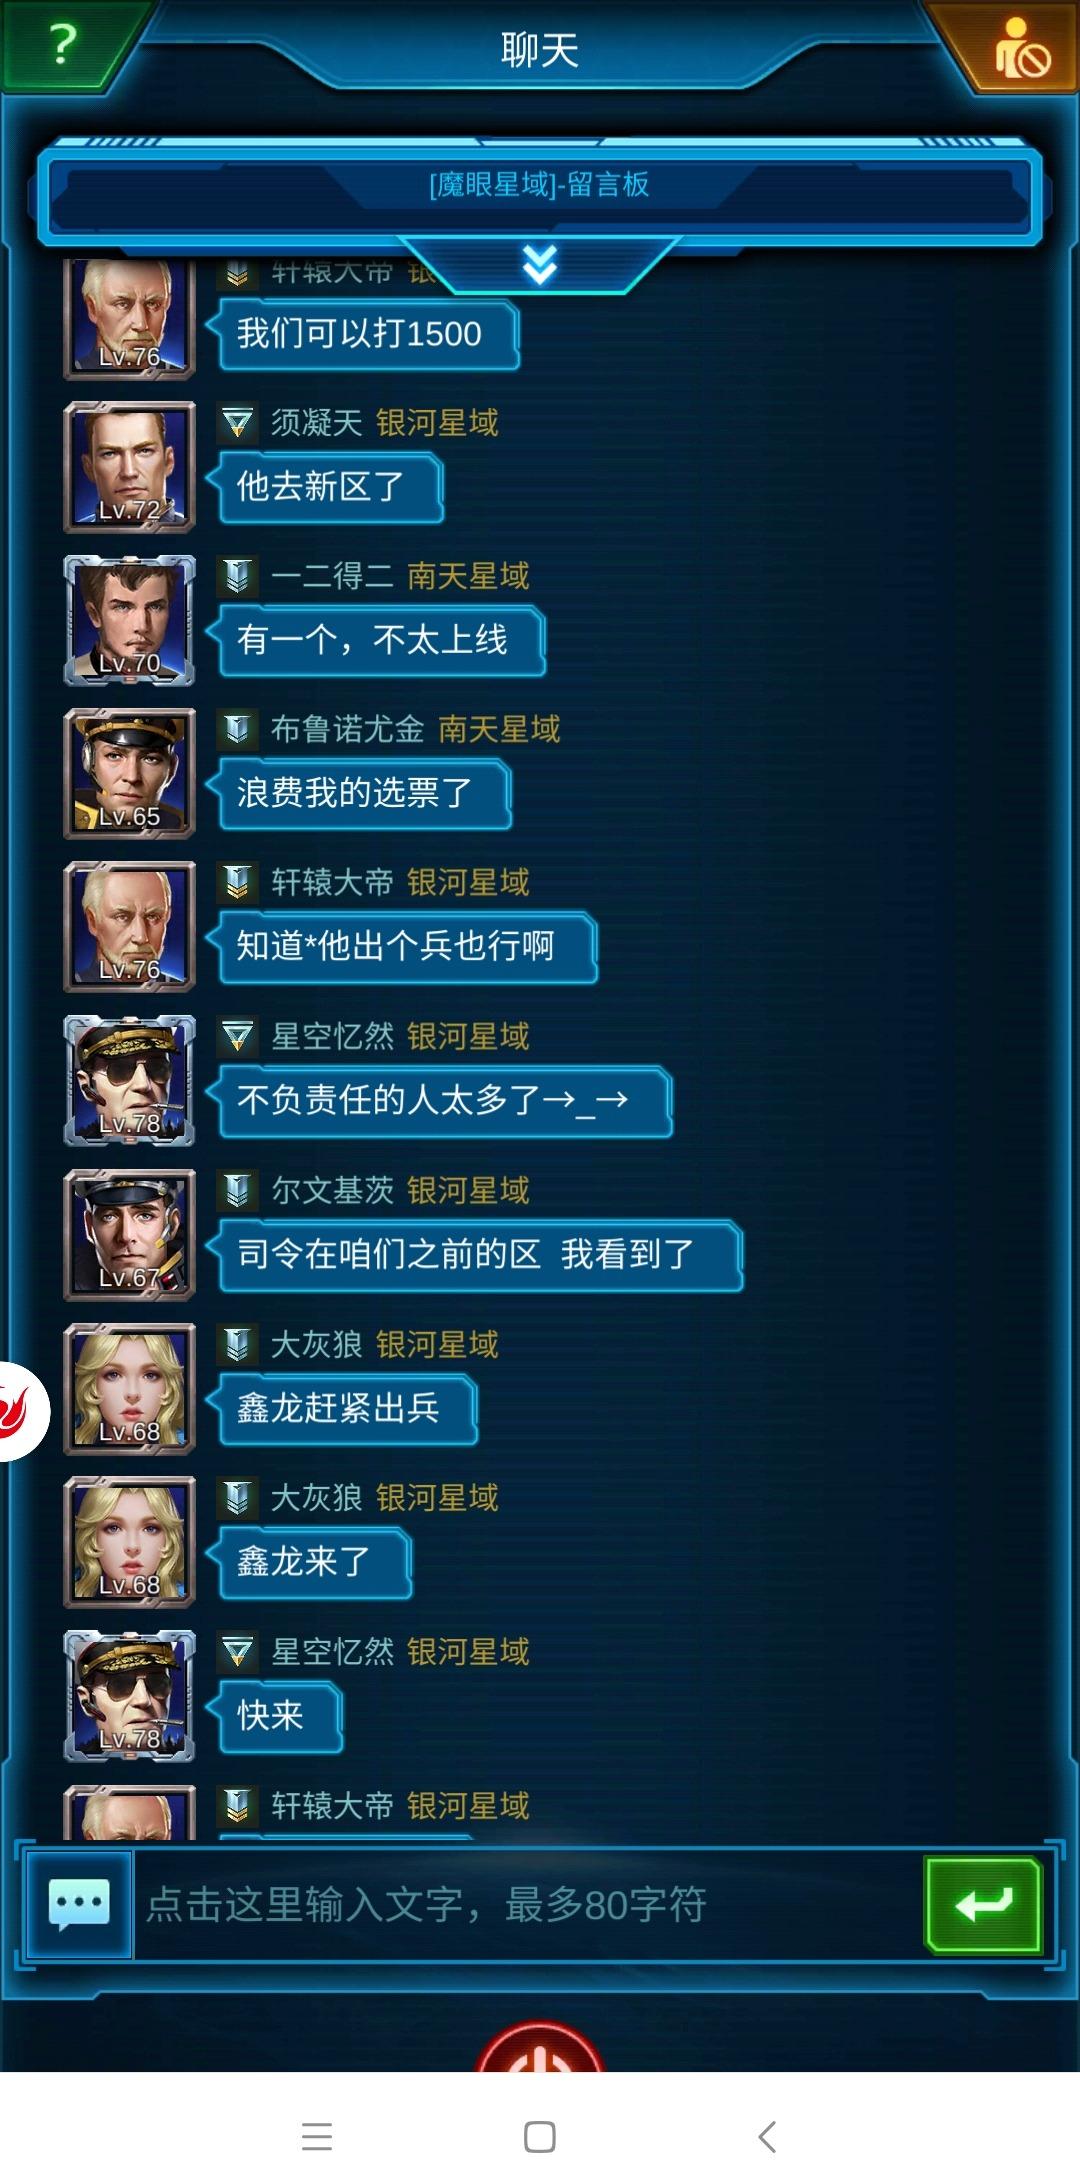 Screenshot_2020-02-15-20-23-21-287_com.jedigames.p16s.luobo.jpg